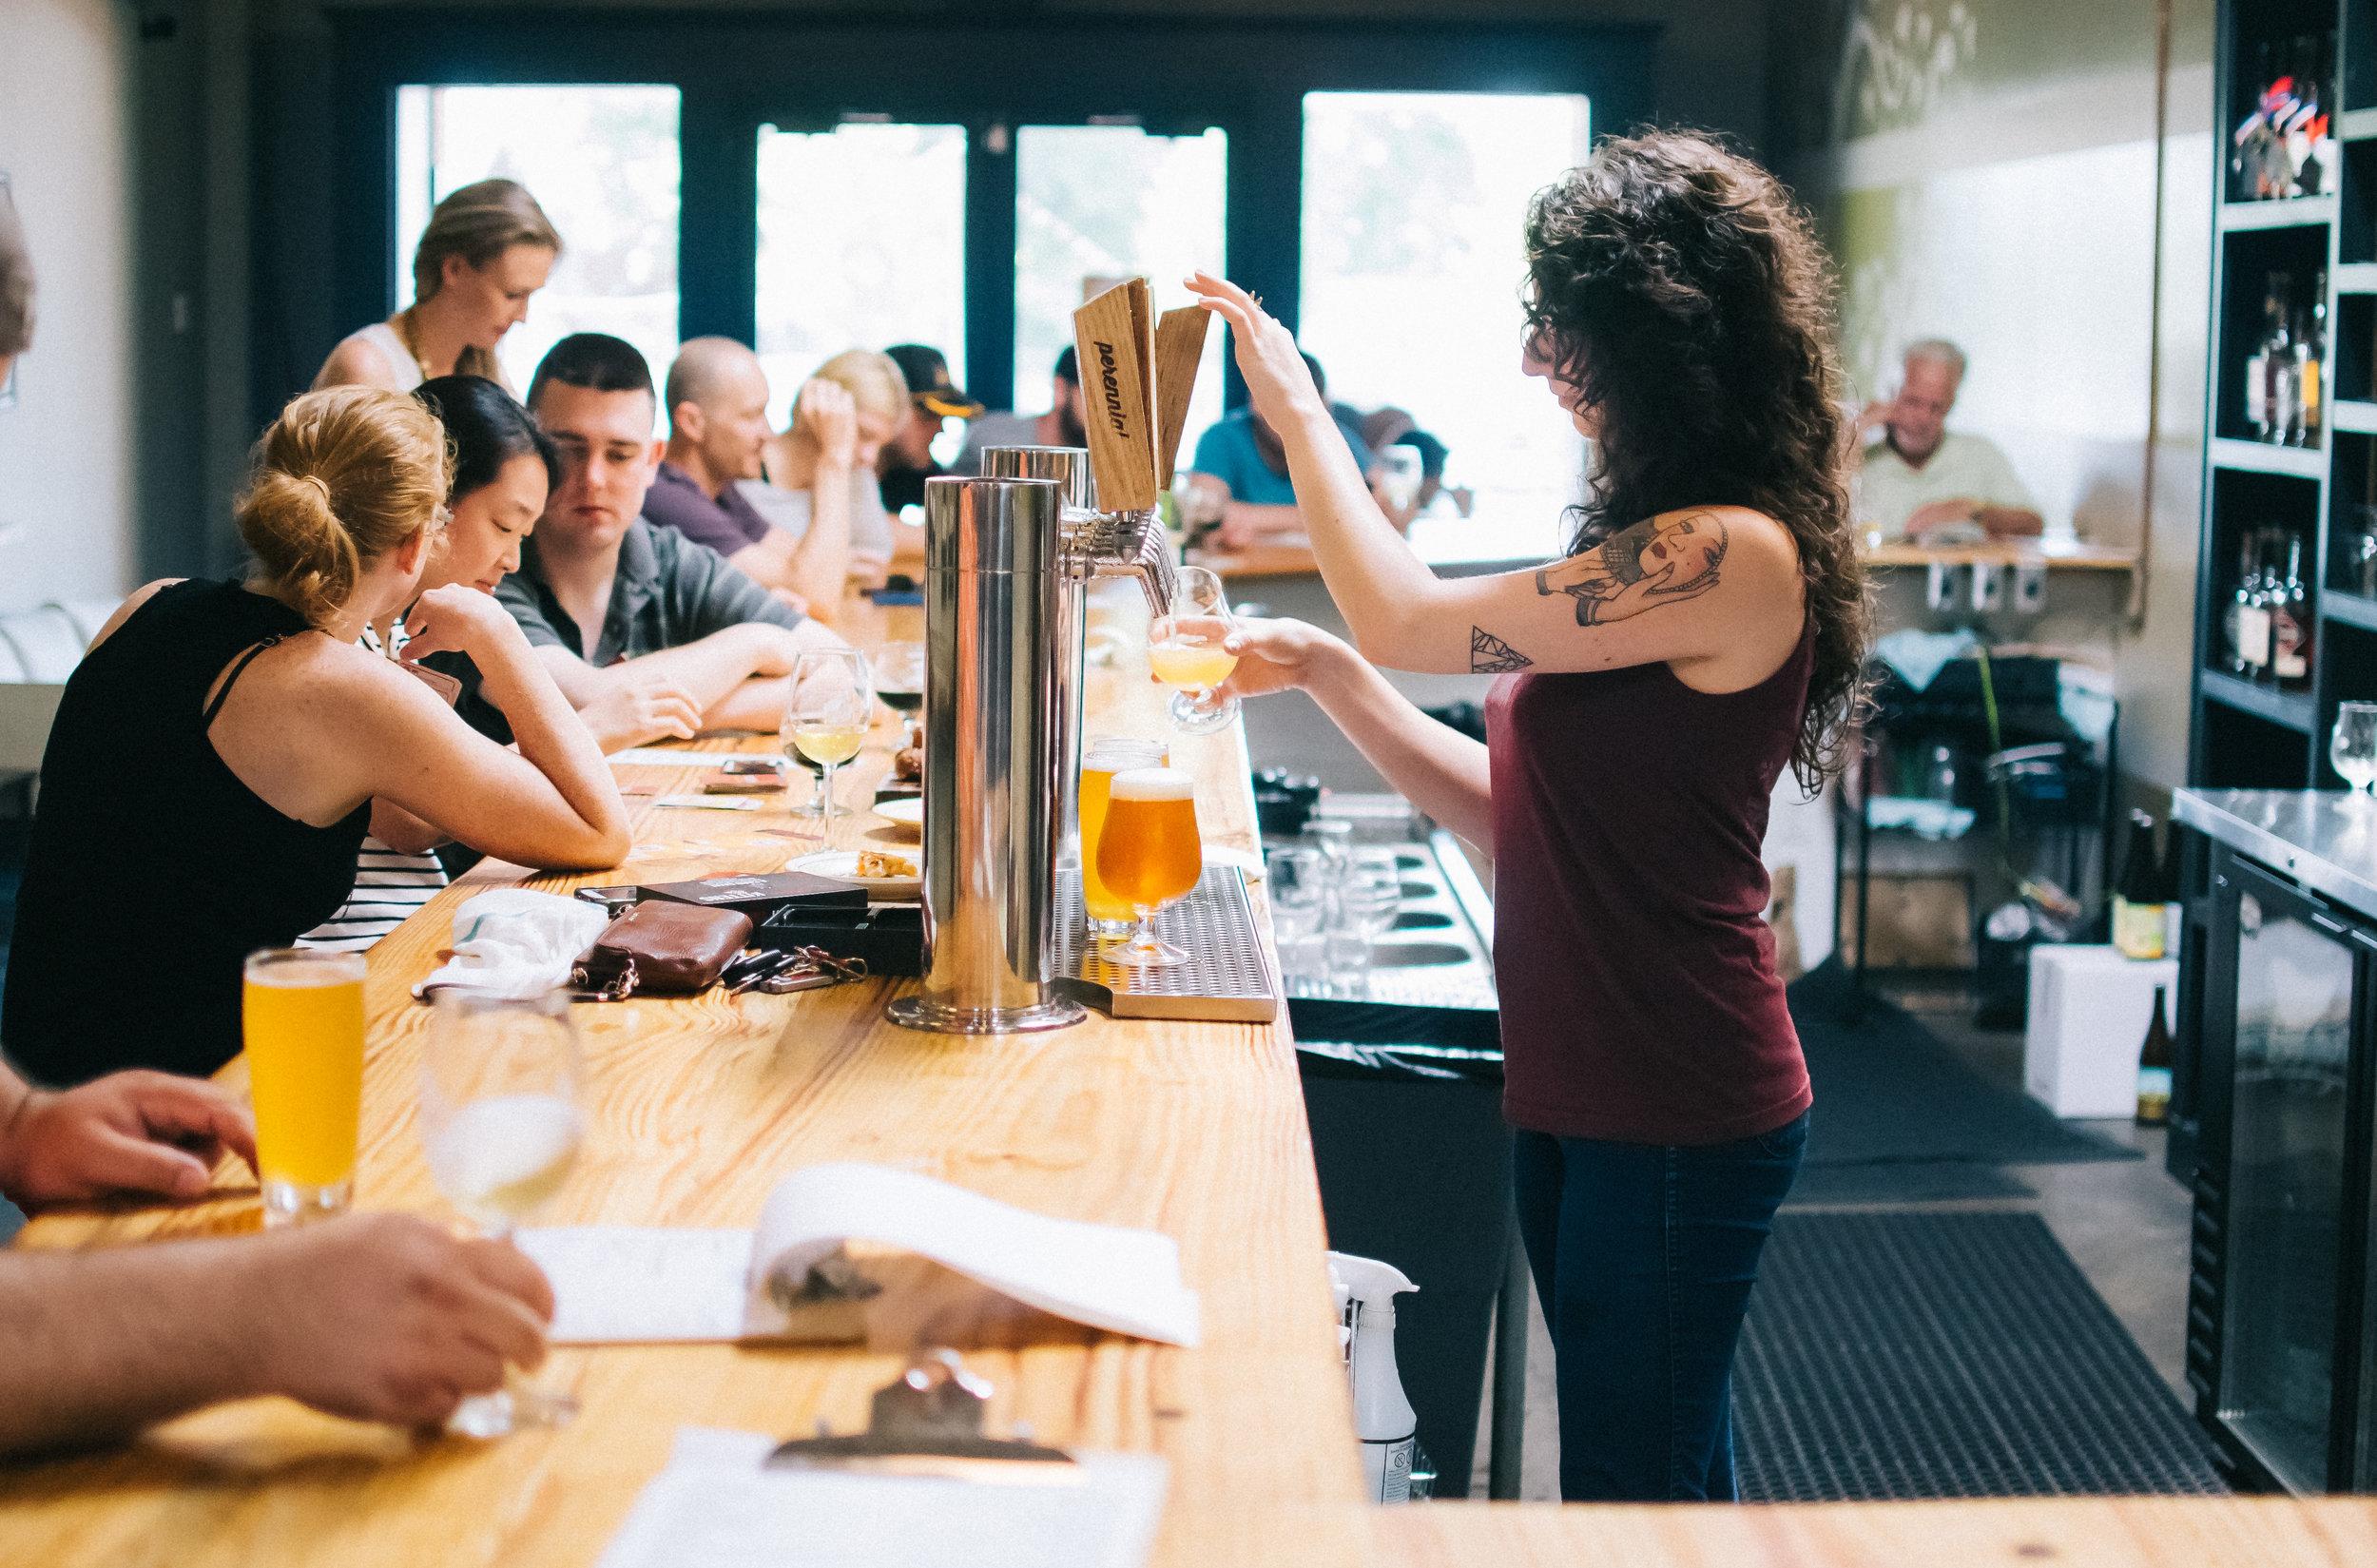 Perennial-Artisan-Ales-St-Louis-Missouri-Beer-Matt-Sampson-Photography-Bar.jpg